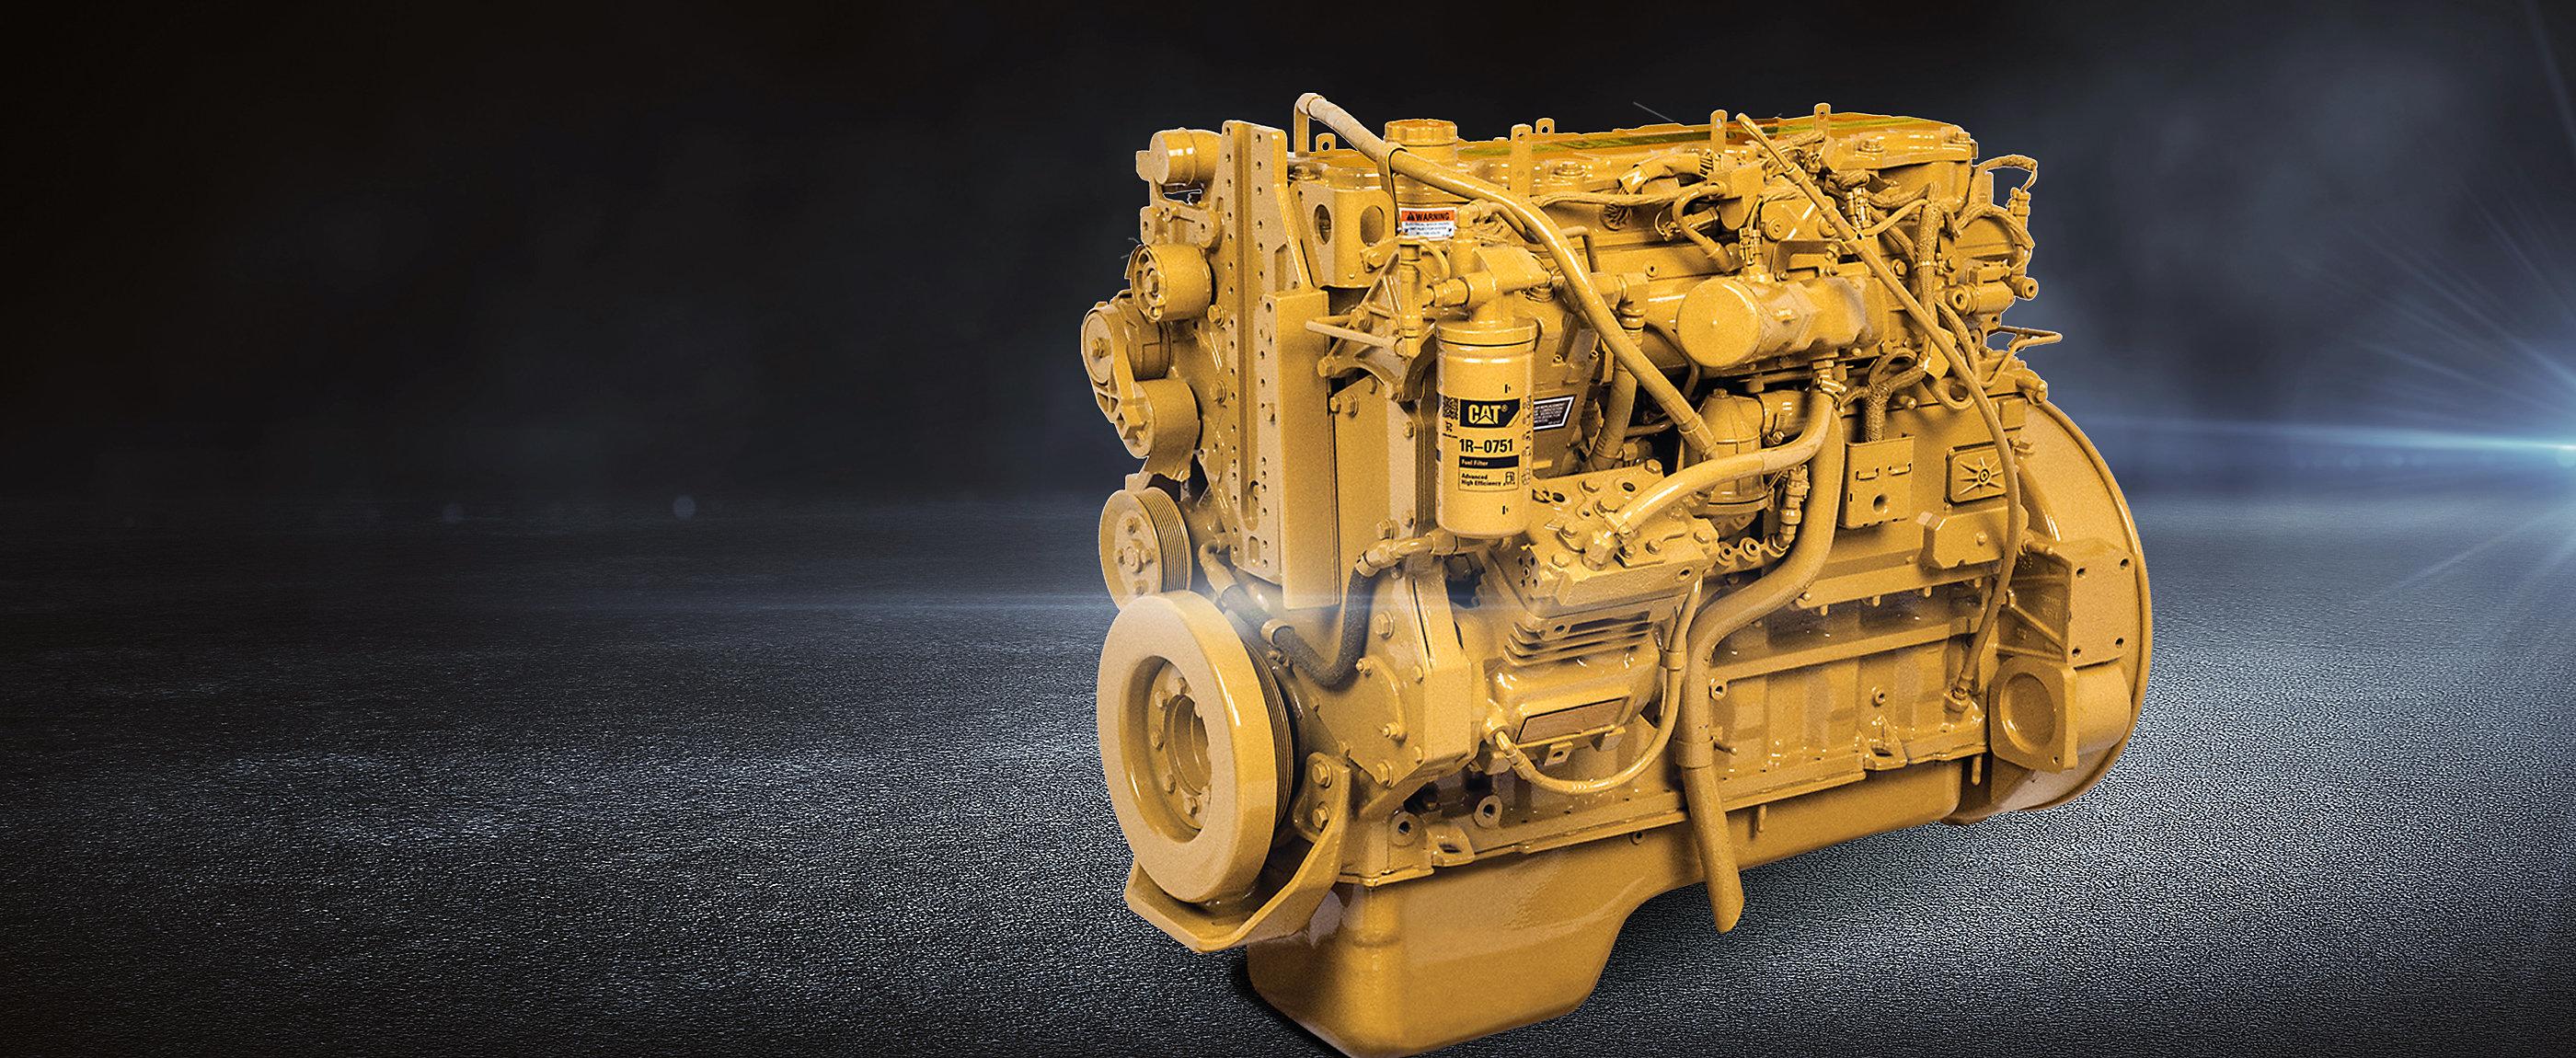 Medium-Duty Engine